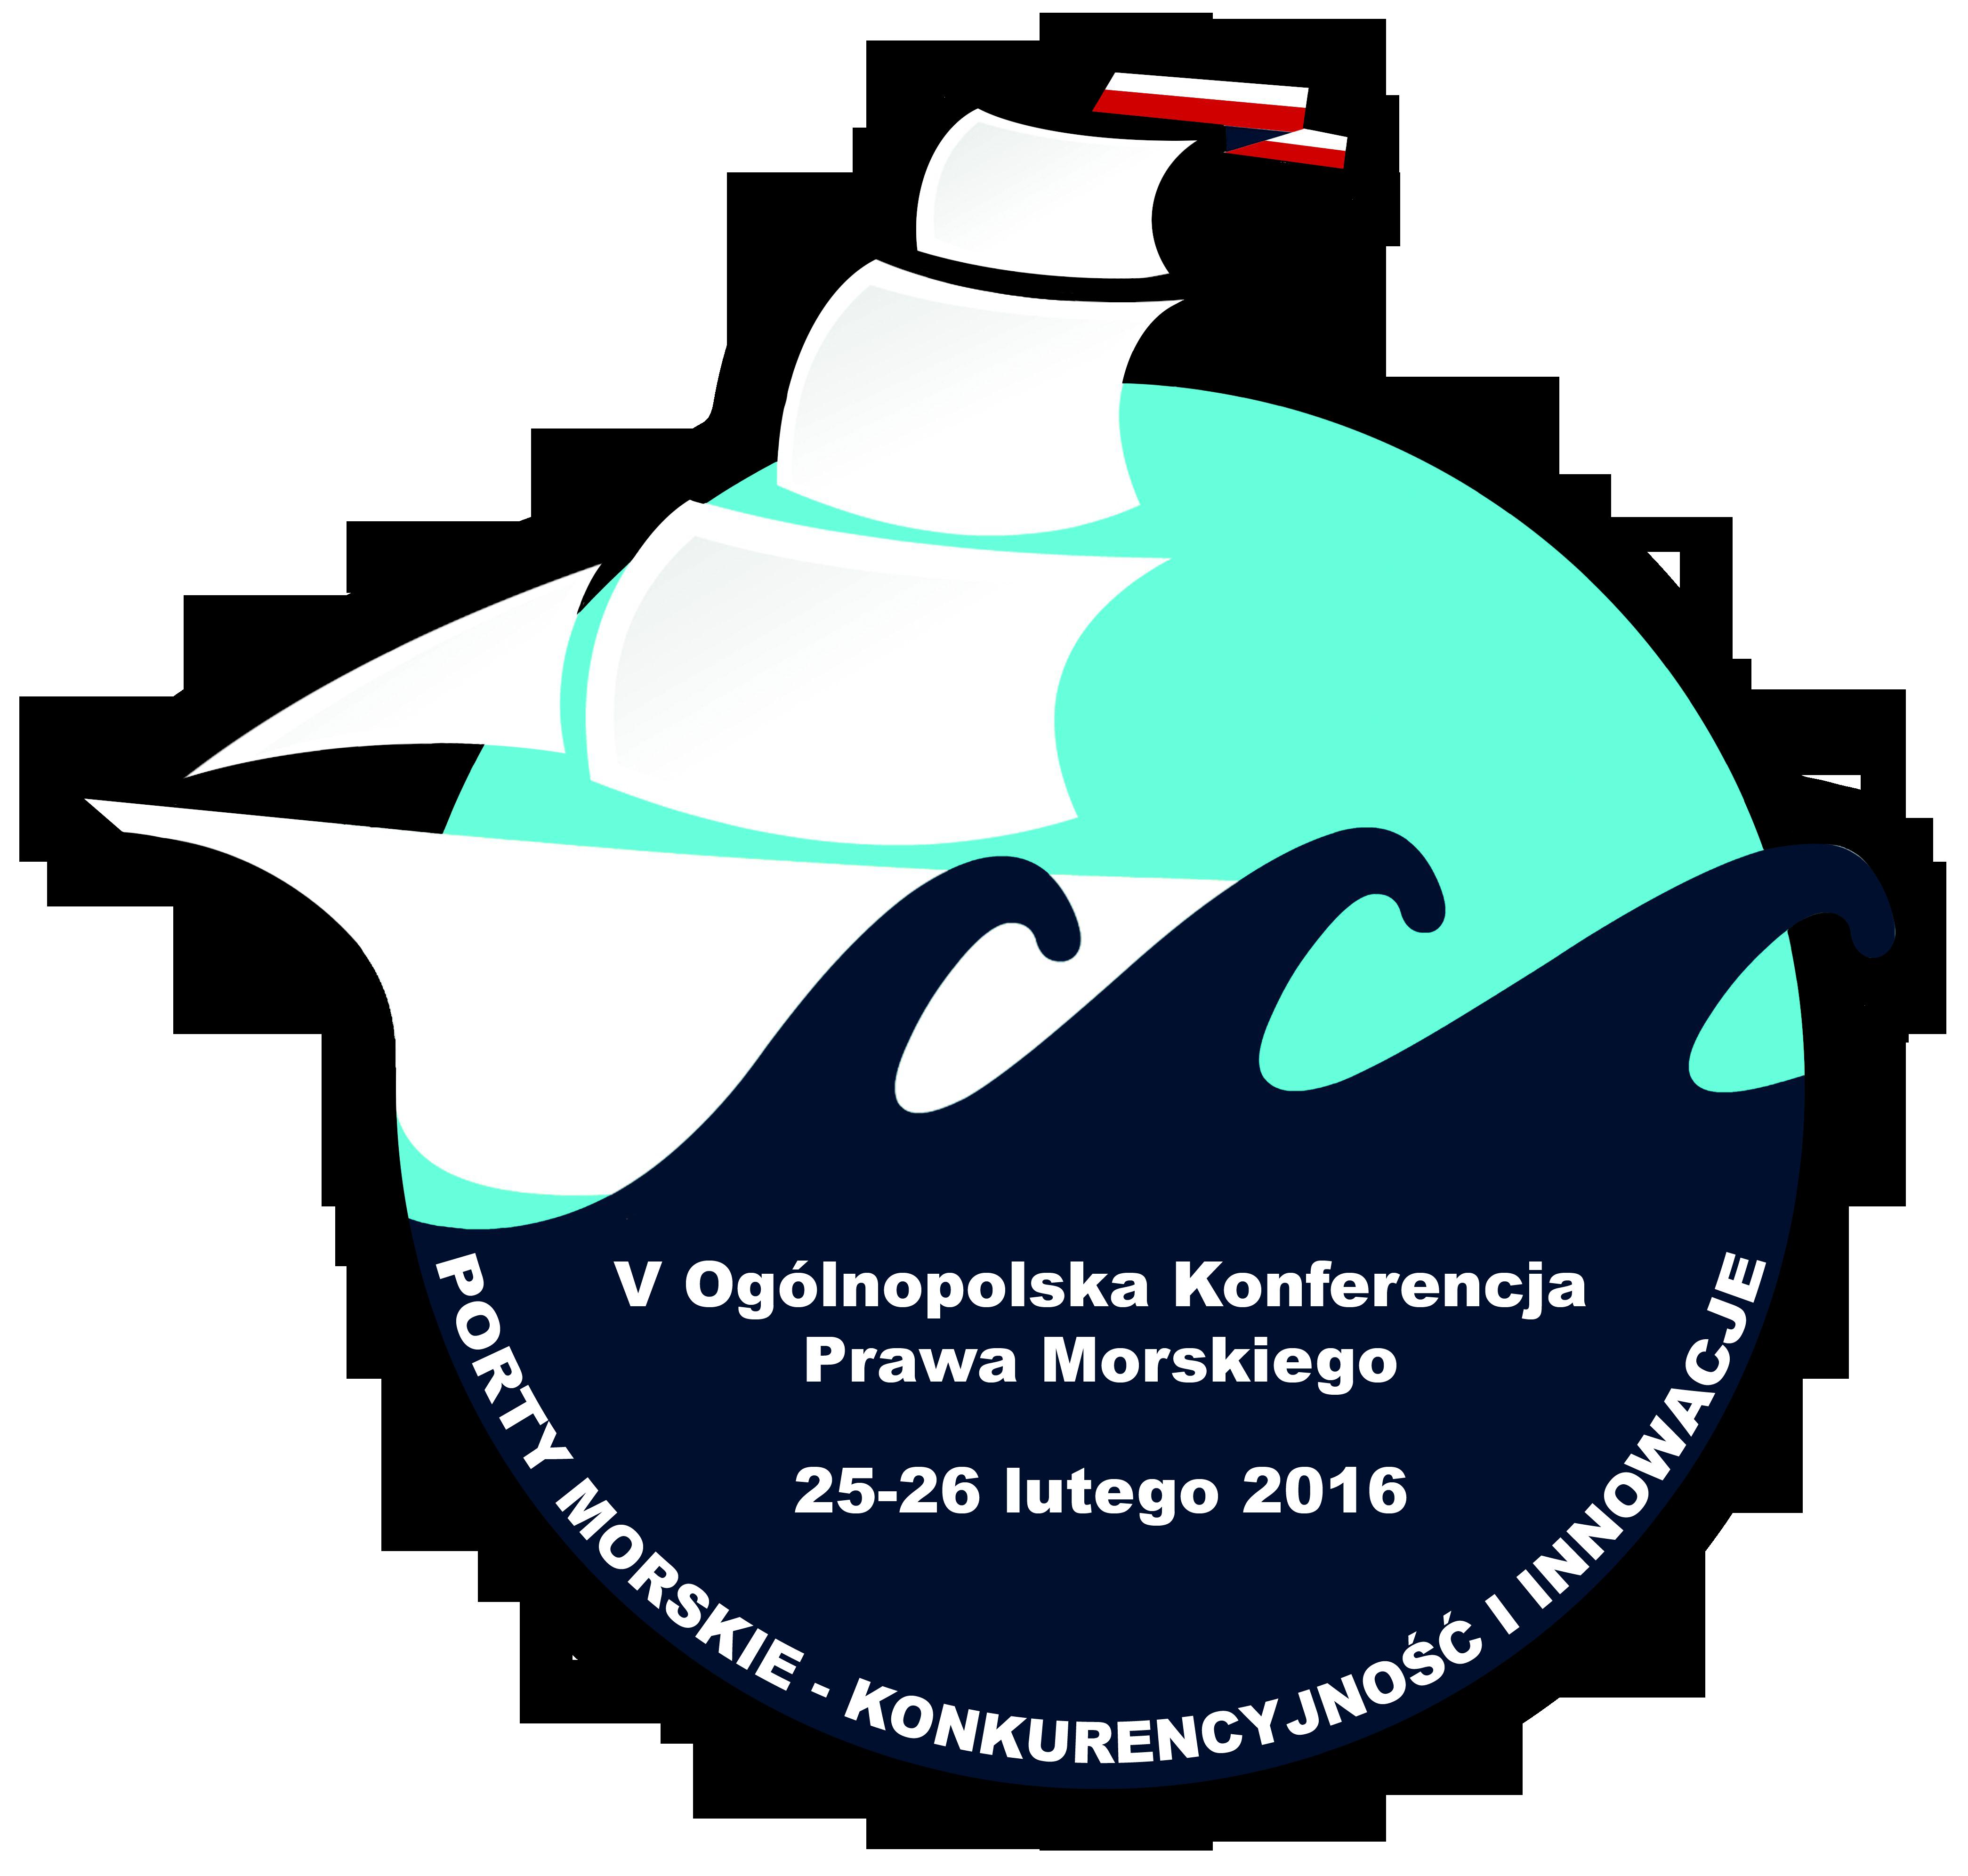 http://prawo-morskie.pl/wp-content/uploads/2016/01/logo5big.png